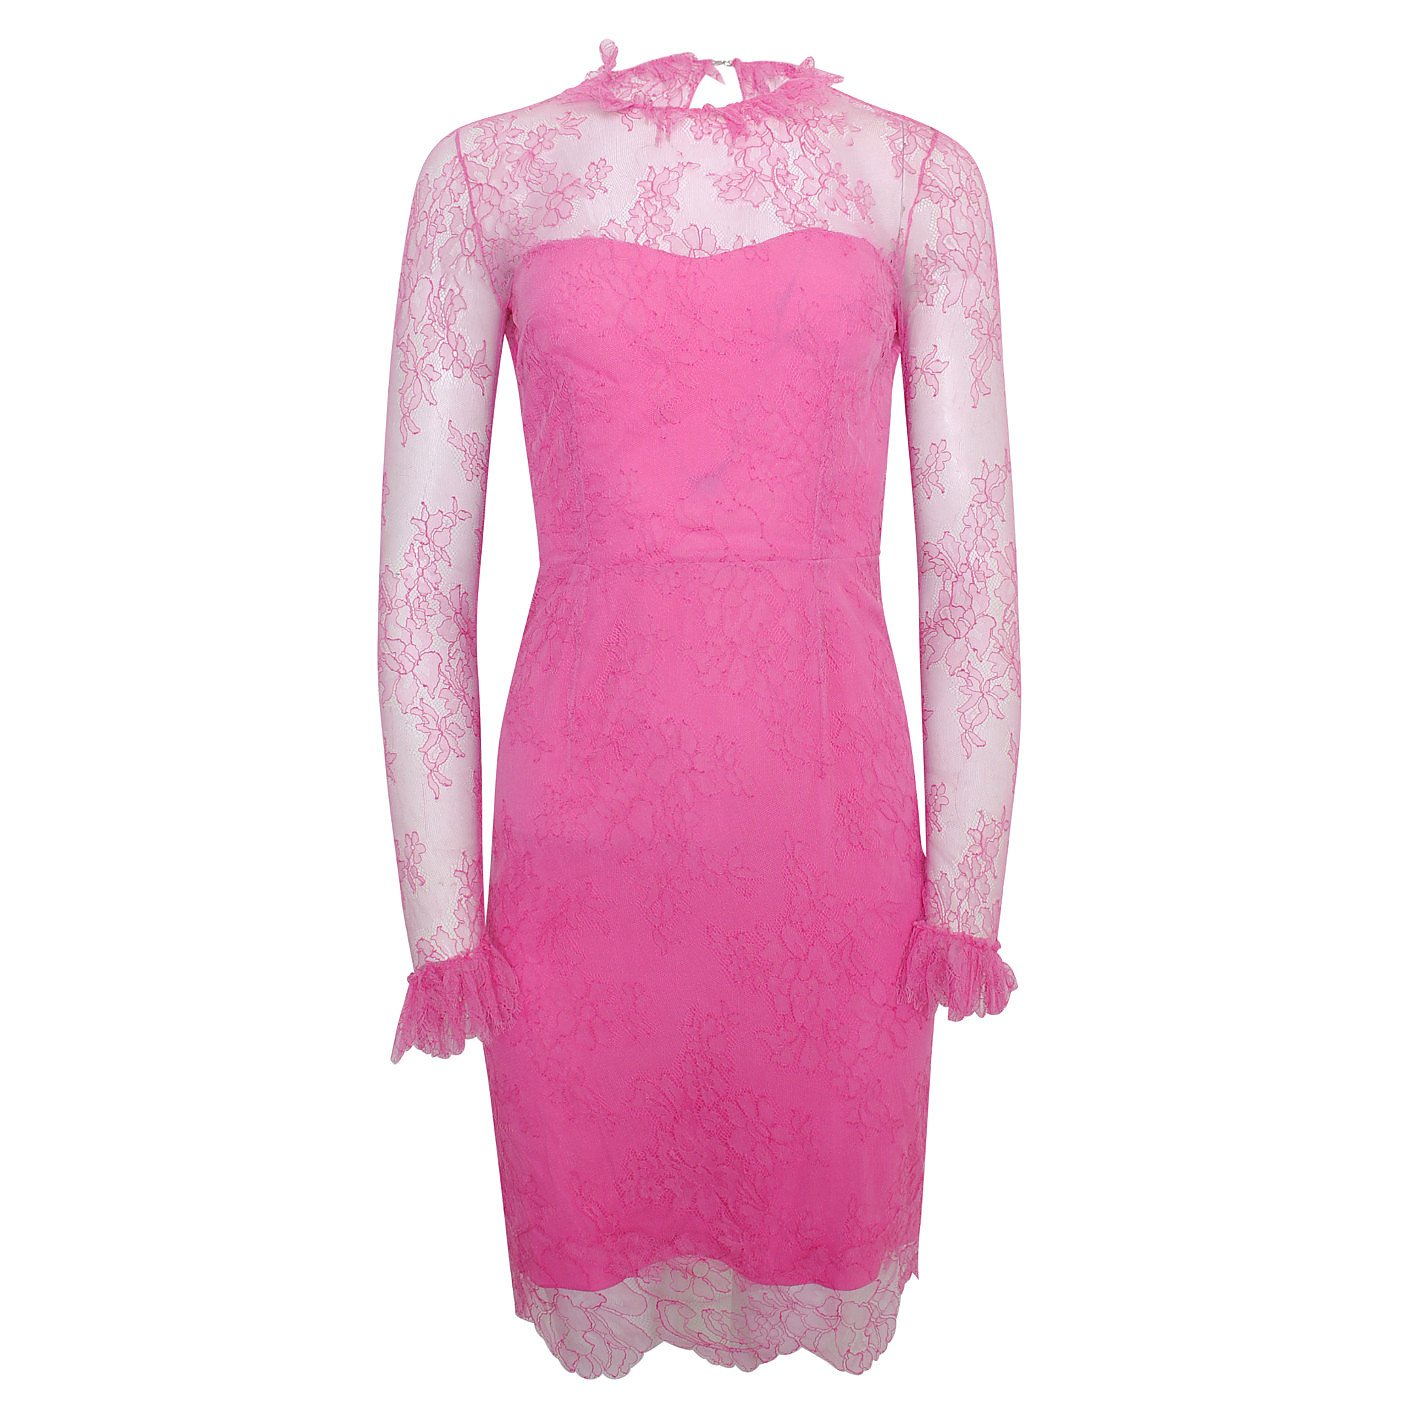 Emilio De La Morena Lace Dress With Ruffle Trim